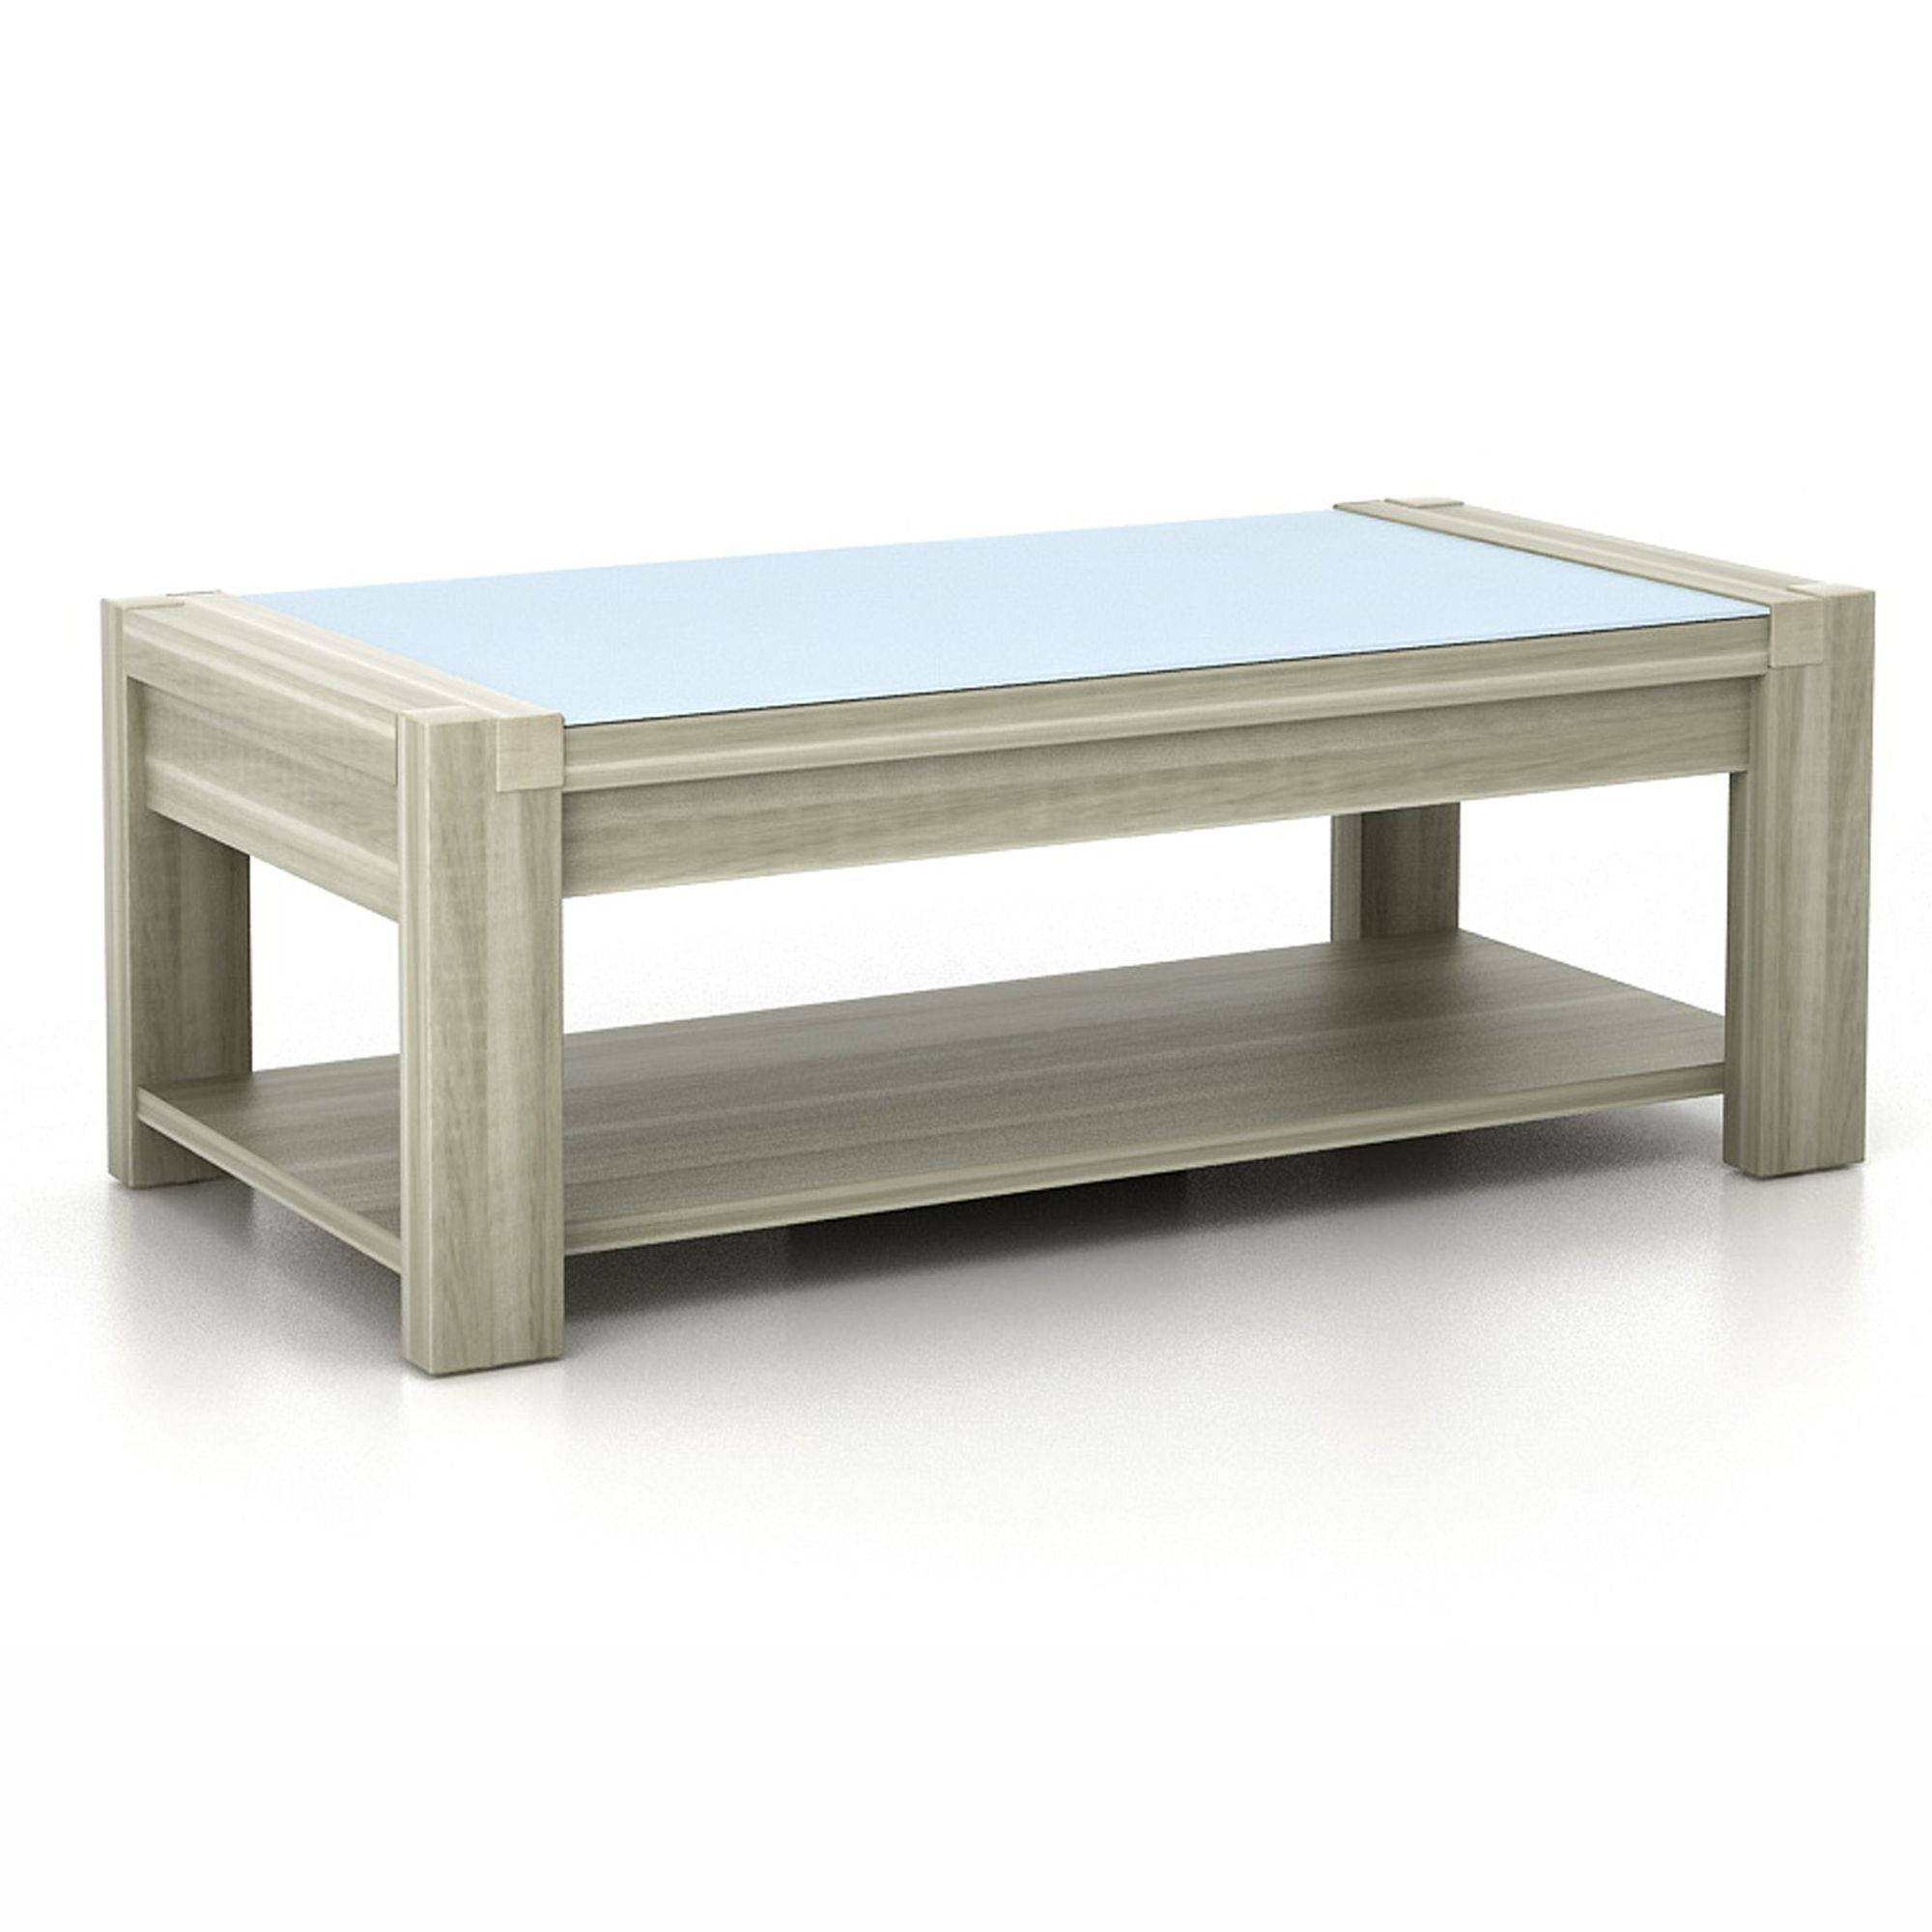 8dee4b9dc964fa974e79abf1adf2f3d8 Luxe De La Redoute Table Basse Scandinave Concept